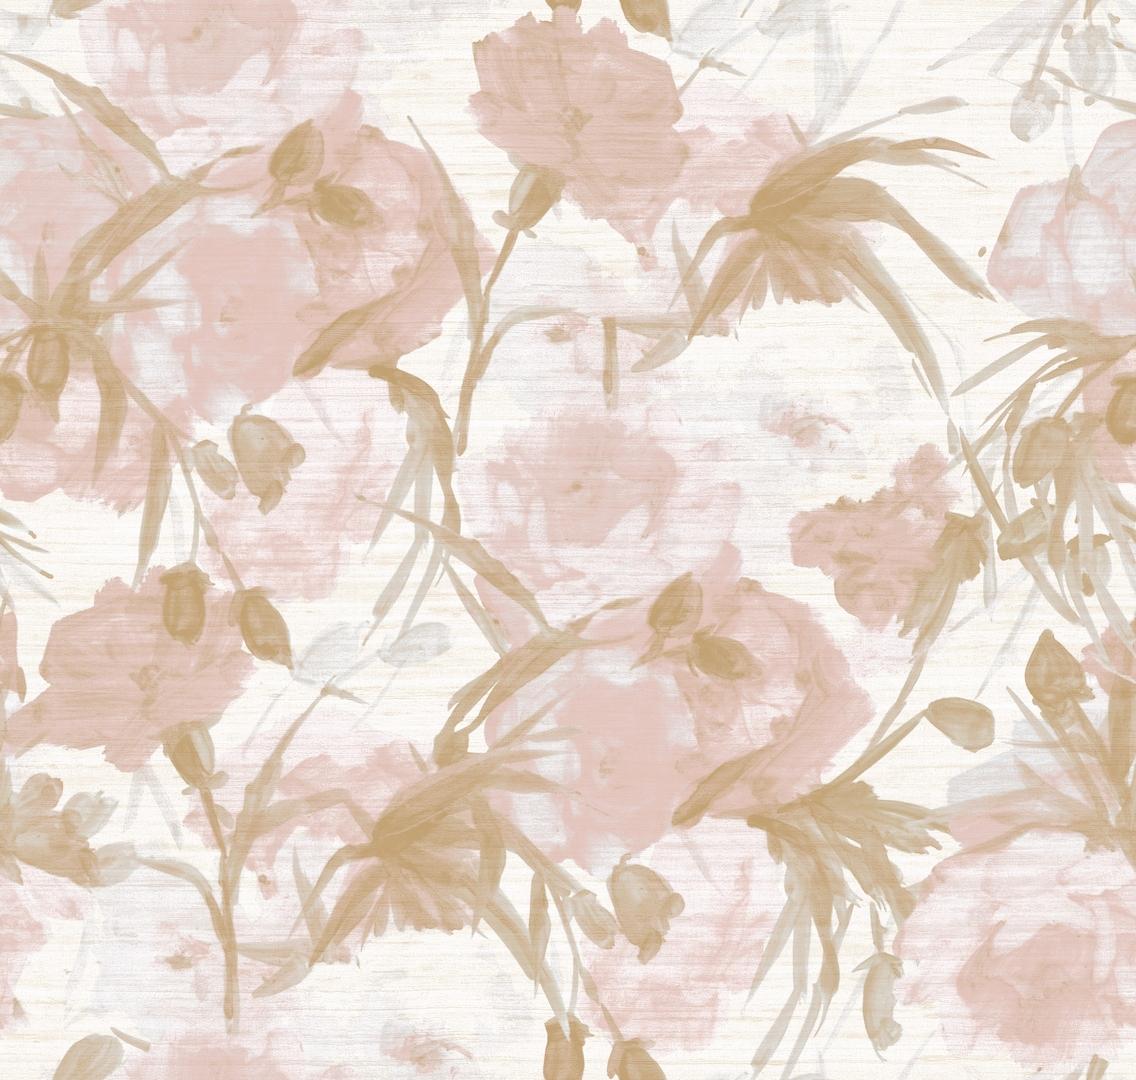 VP_855_02_una-bella-storia-papier-peint-fleurs